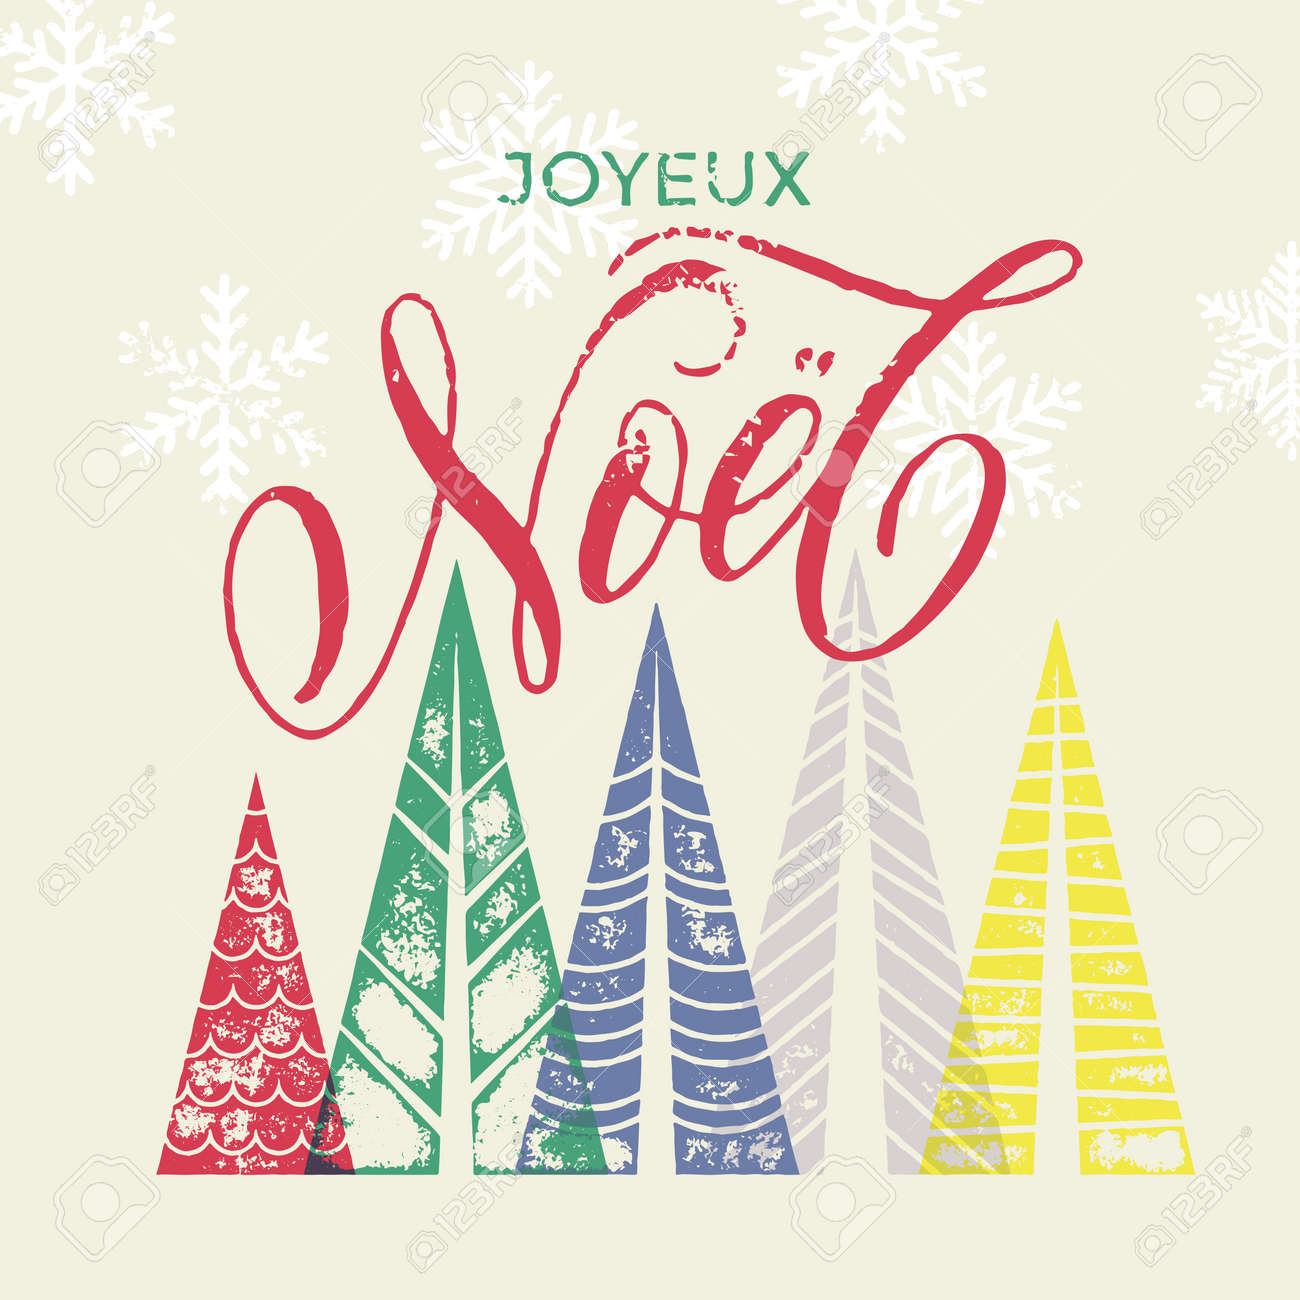 Joyeux Noel Colorful French Winter Holiday Spanish Greeting Card